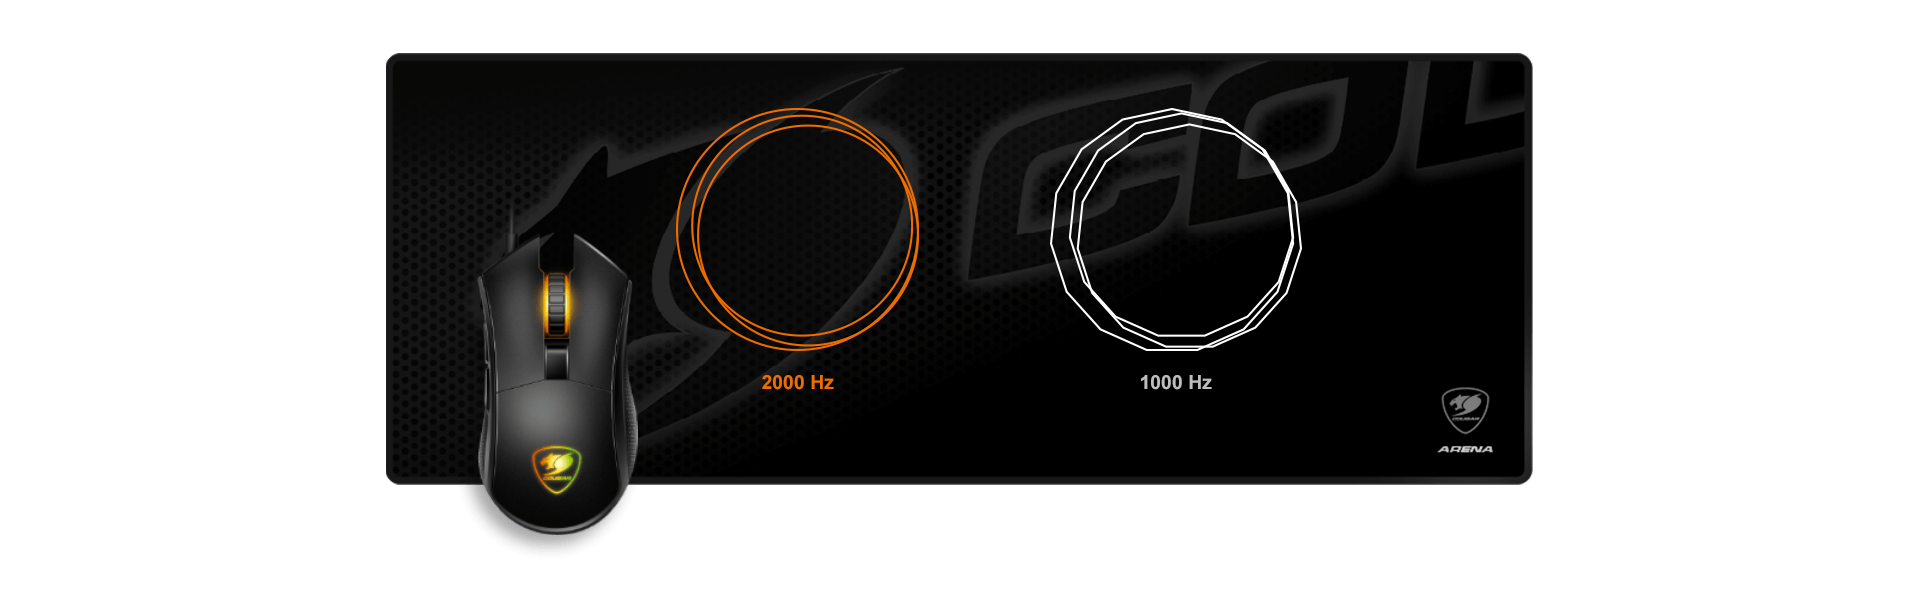 COUGAR Revenger S - Multi-color Backlight System (2 Zone RGB)